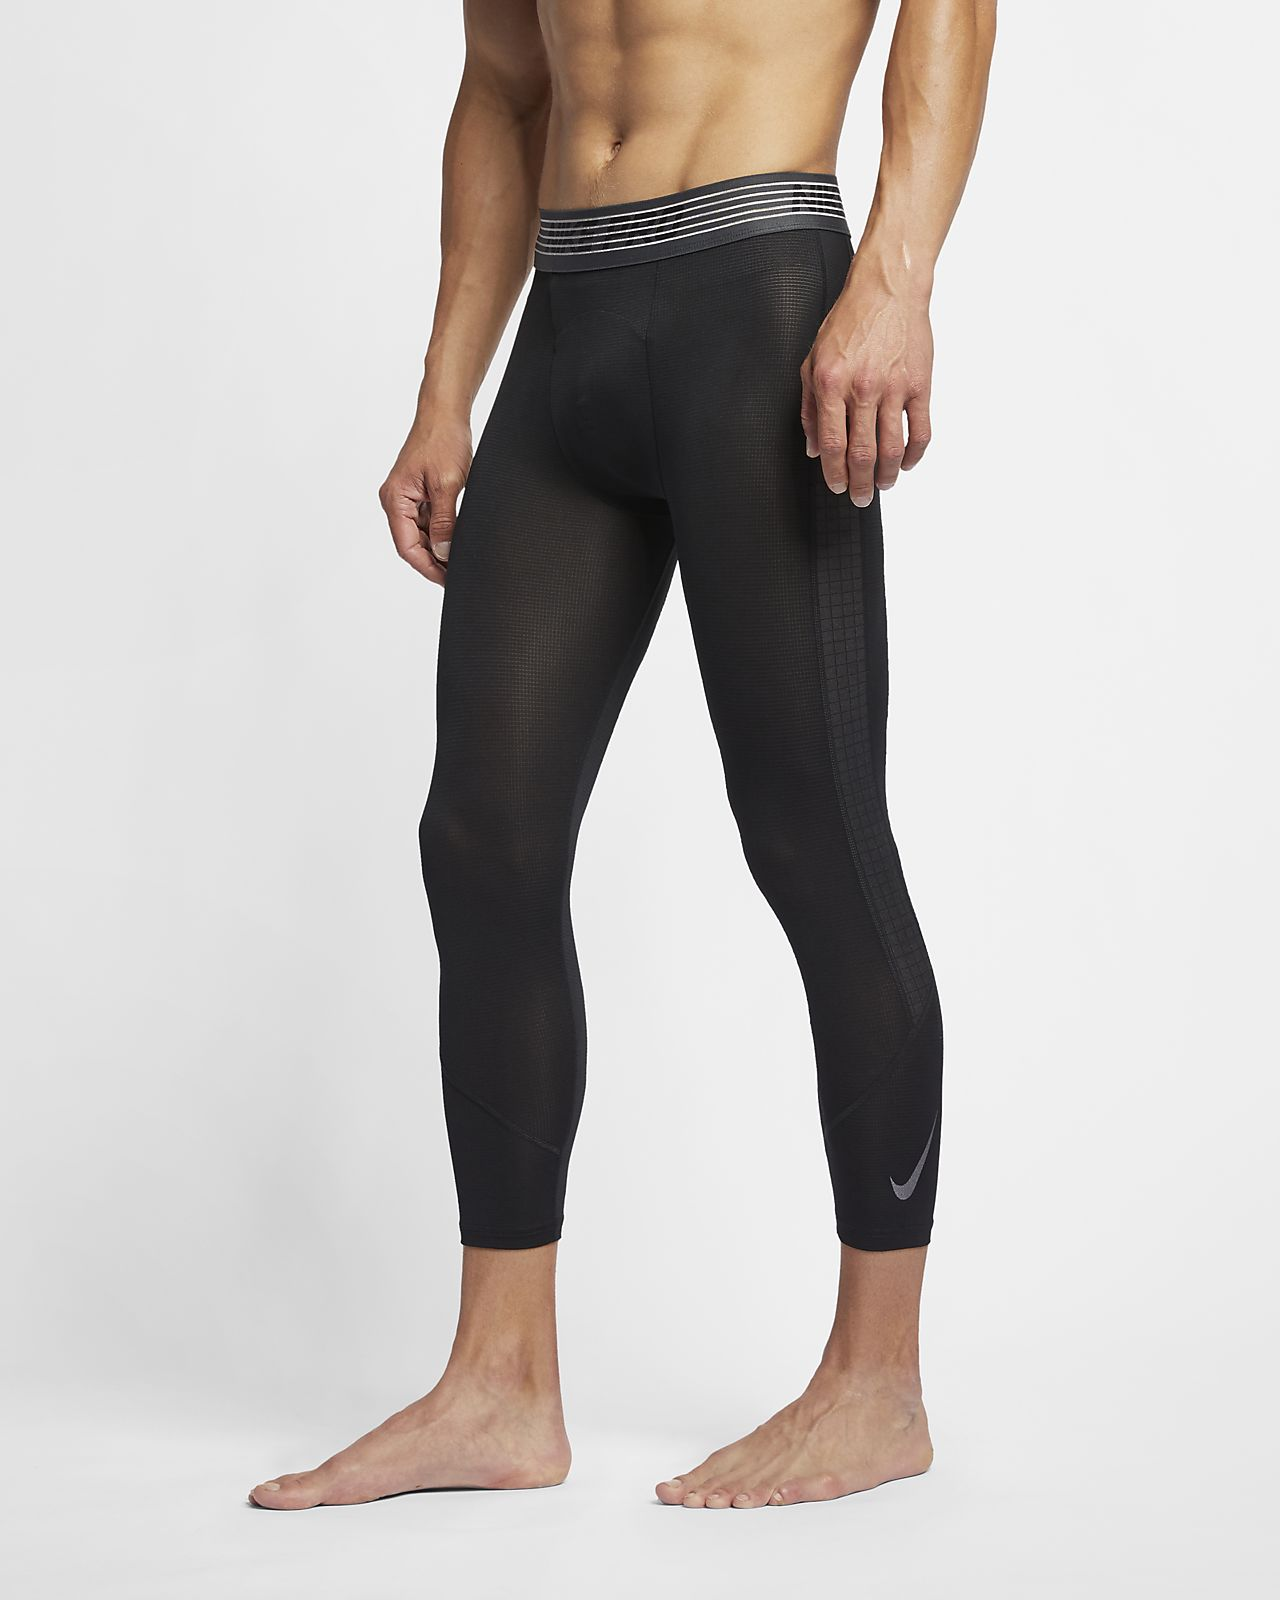 Nike Pro Men's 3/4-Length Tights